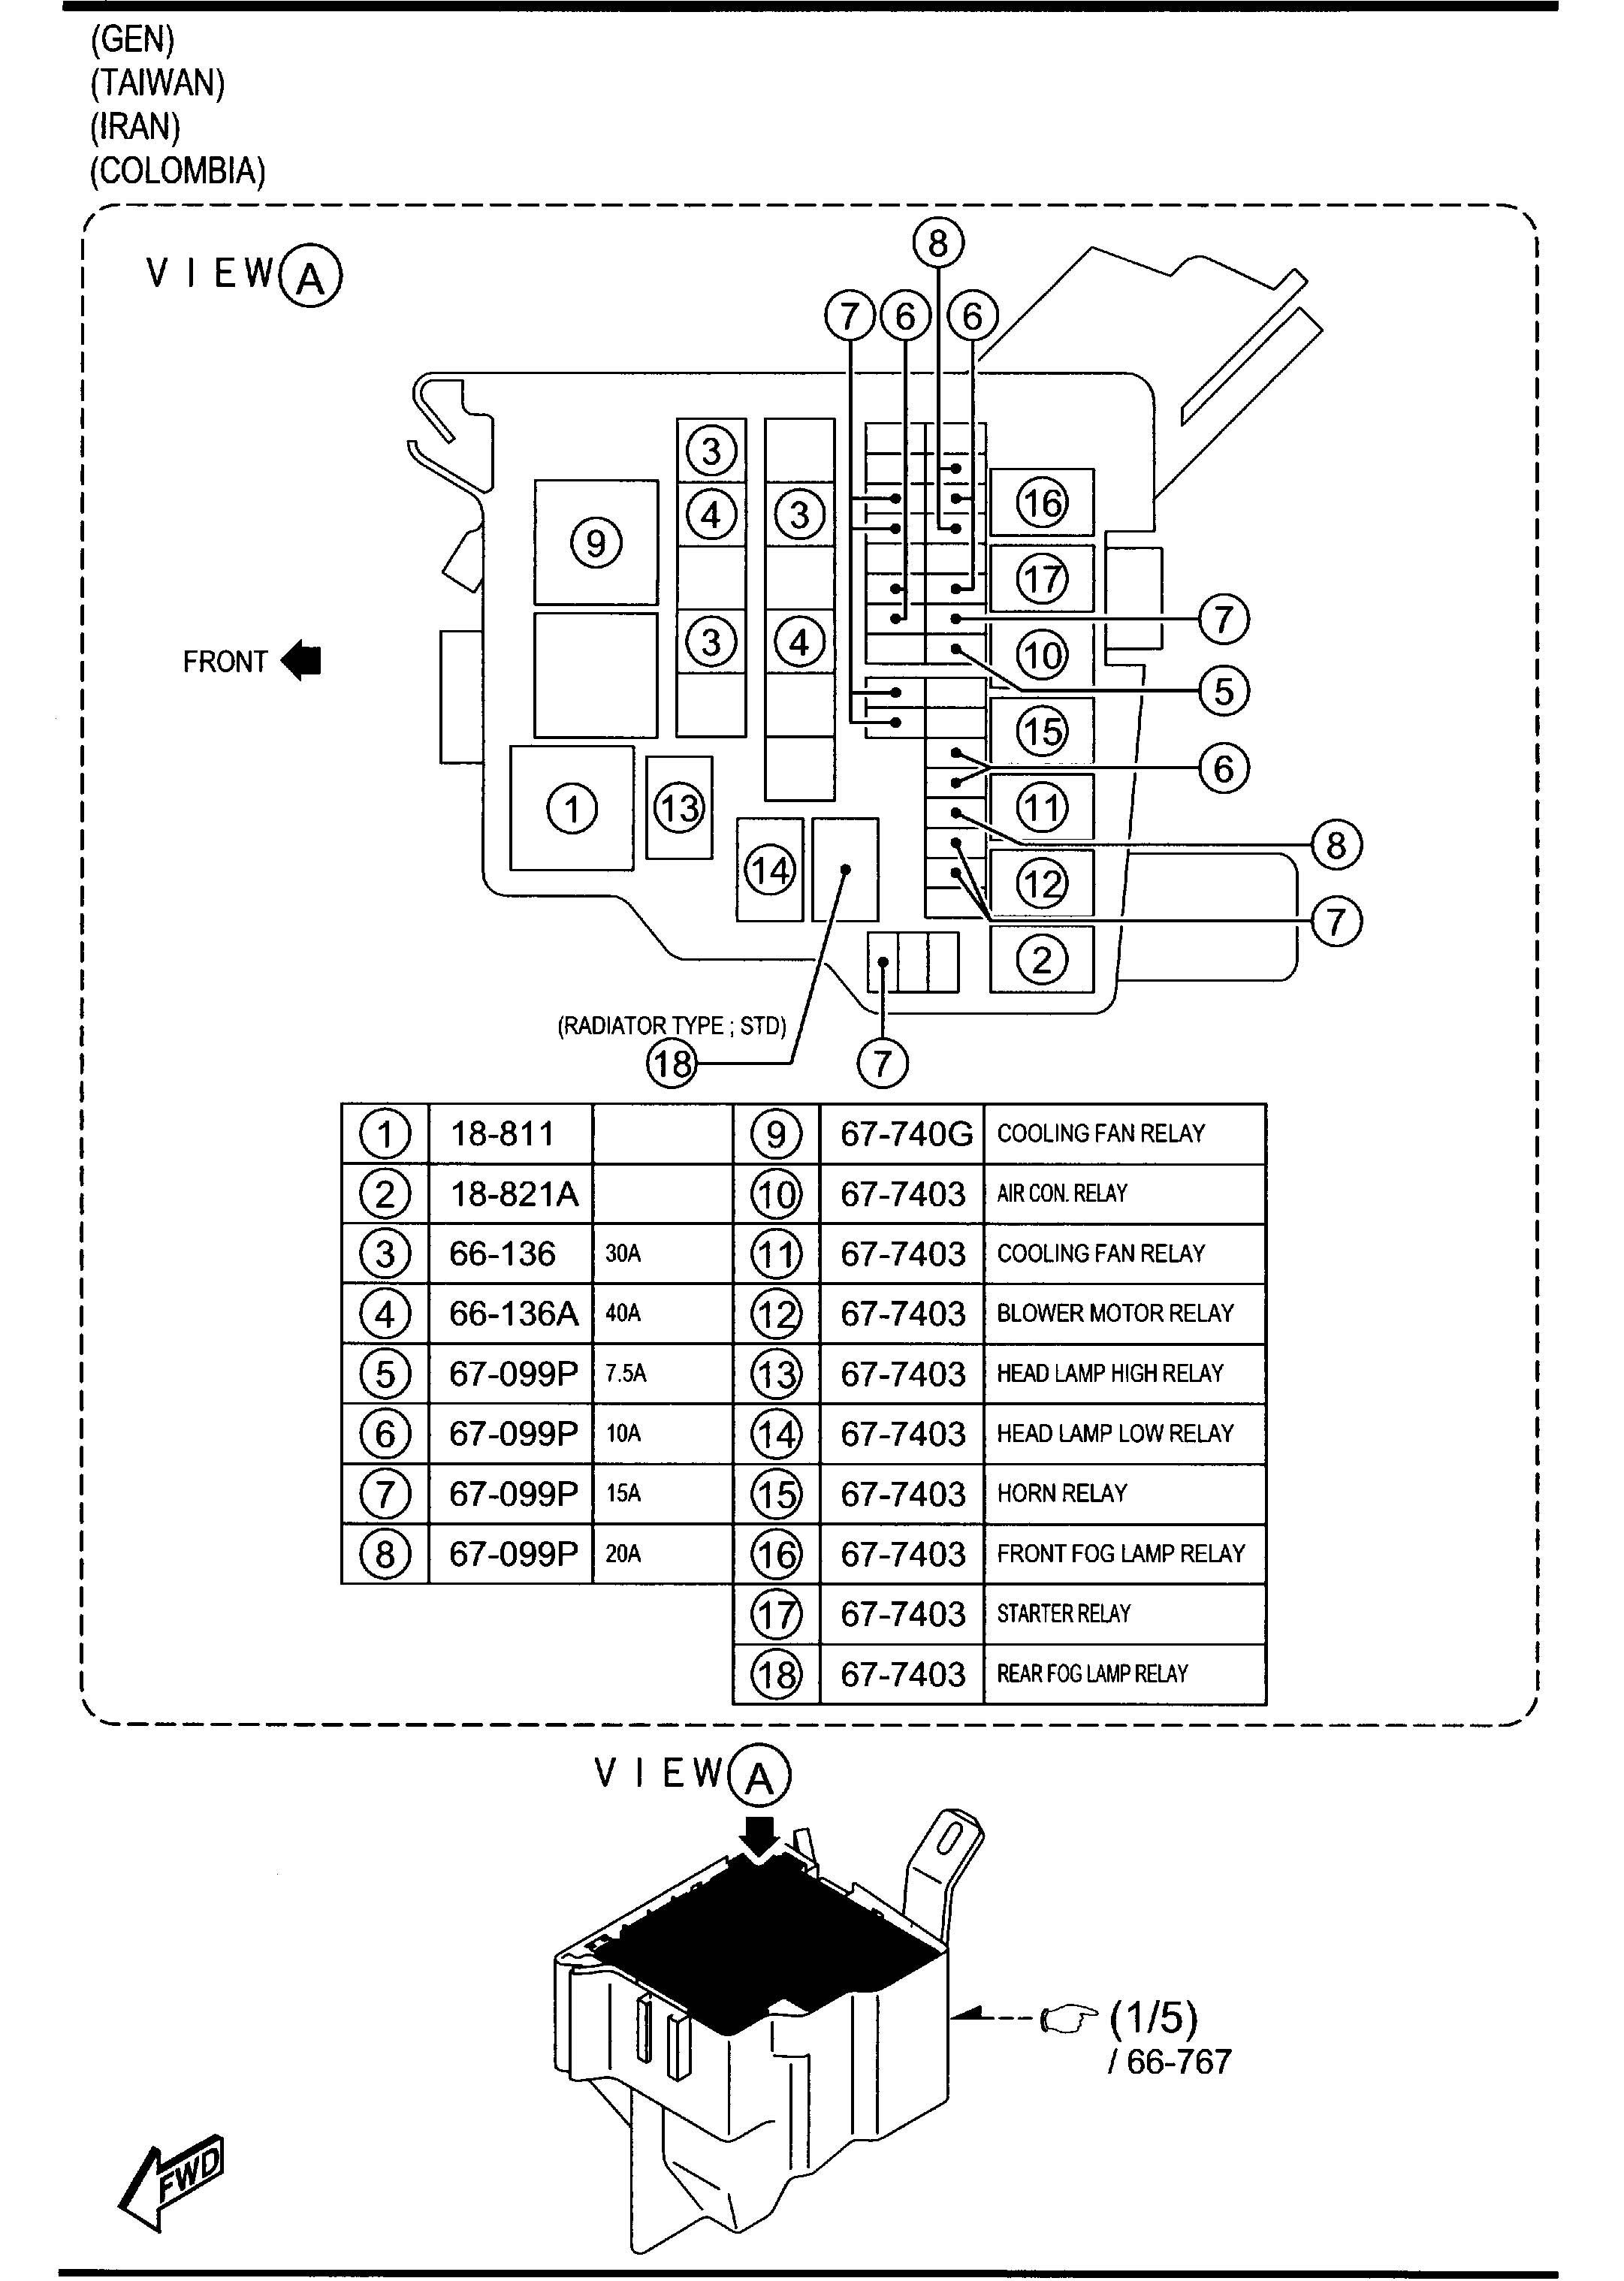 [DIAGRAM] 2012 Mazda Cx 9 Wiring Diagram FULL Version HD